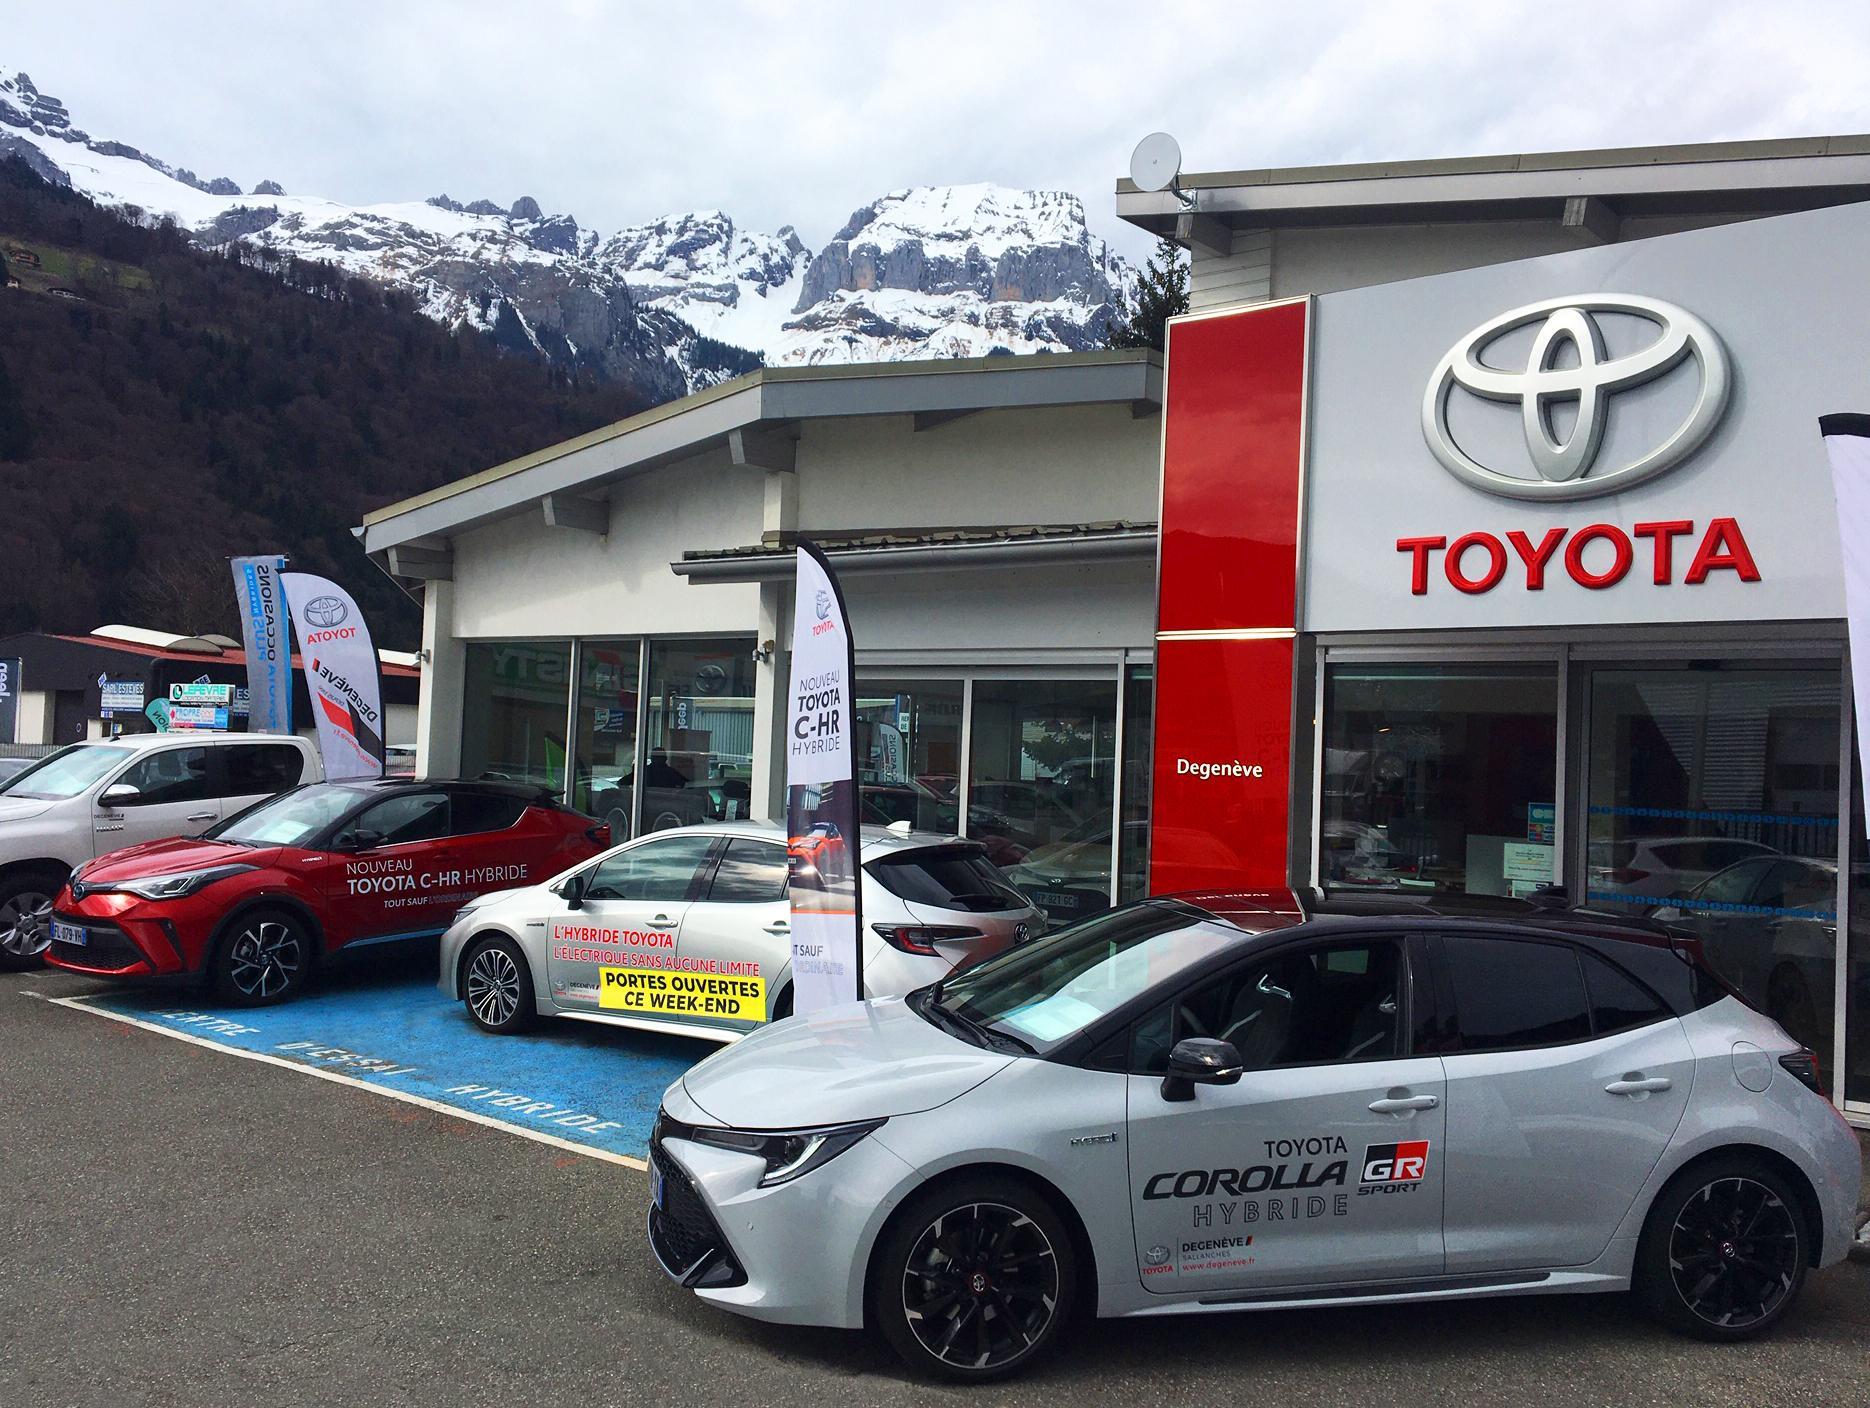 Toyota Degenève Sallanches      Sallanches